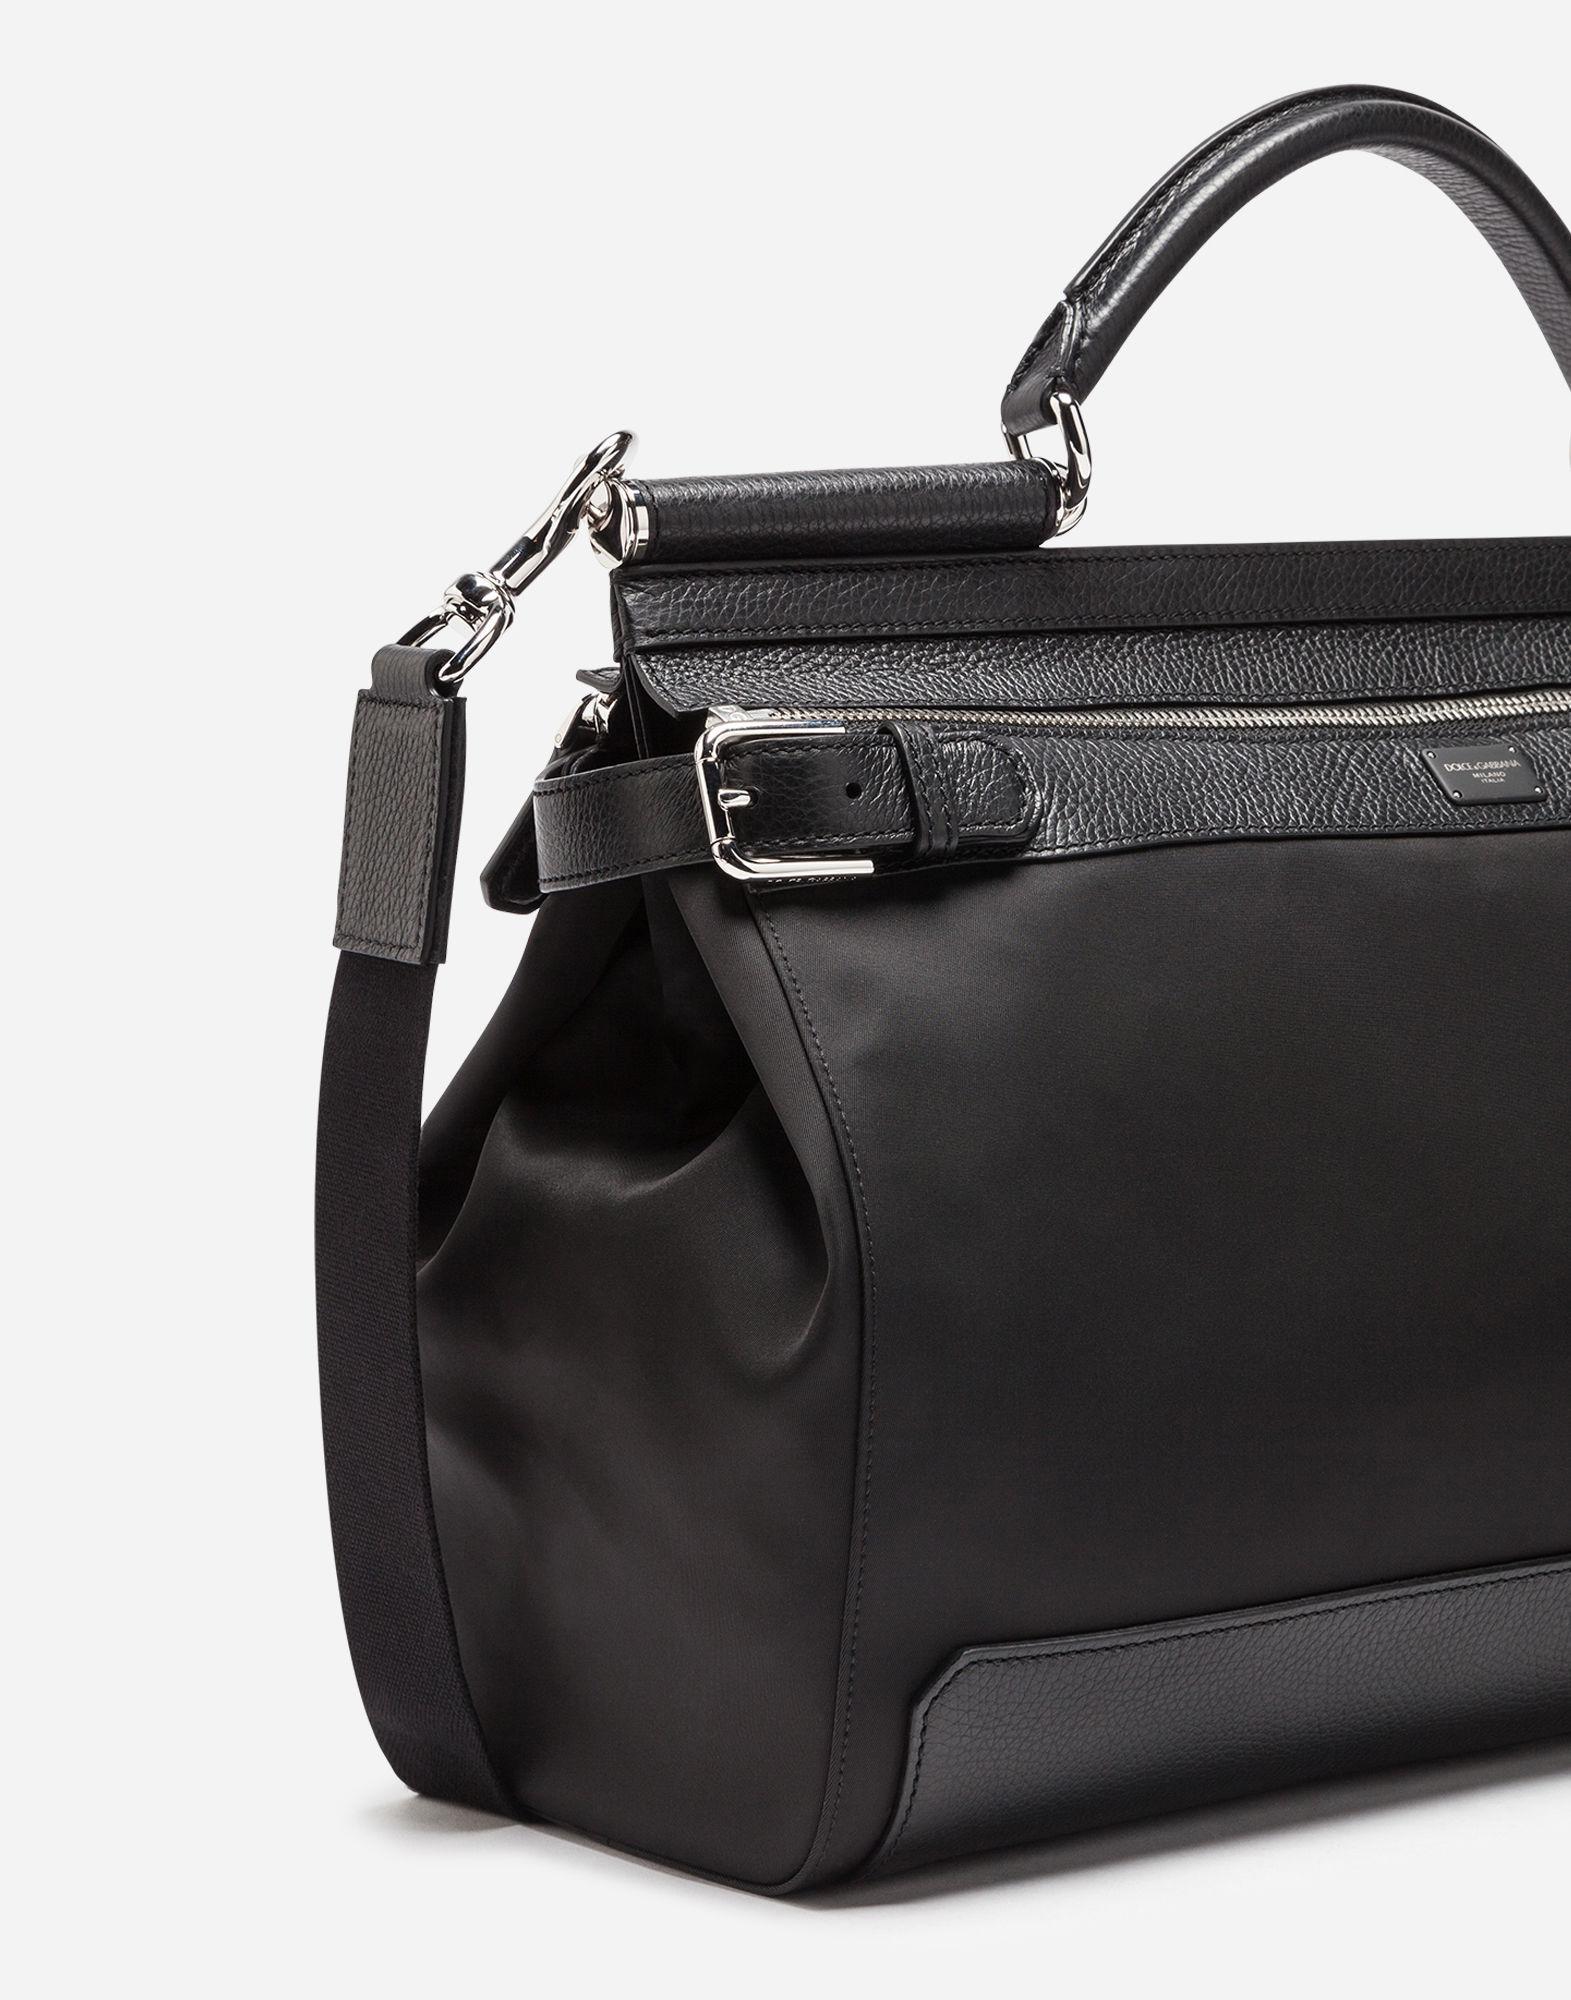 ... Lyst - Dolce Gabbana Nylon Sicily Work Bag in Black new product 06a2f  43c4c ... 24c9e2e293